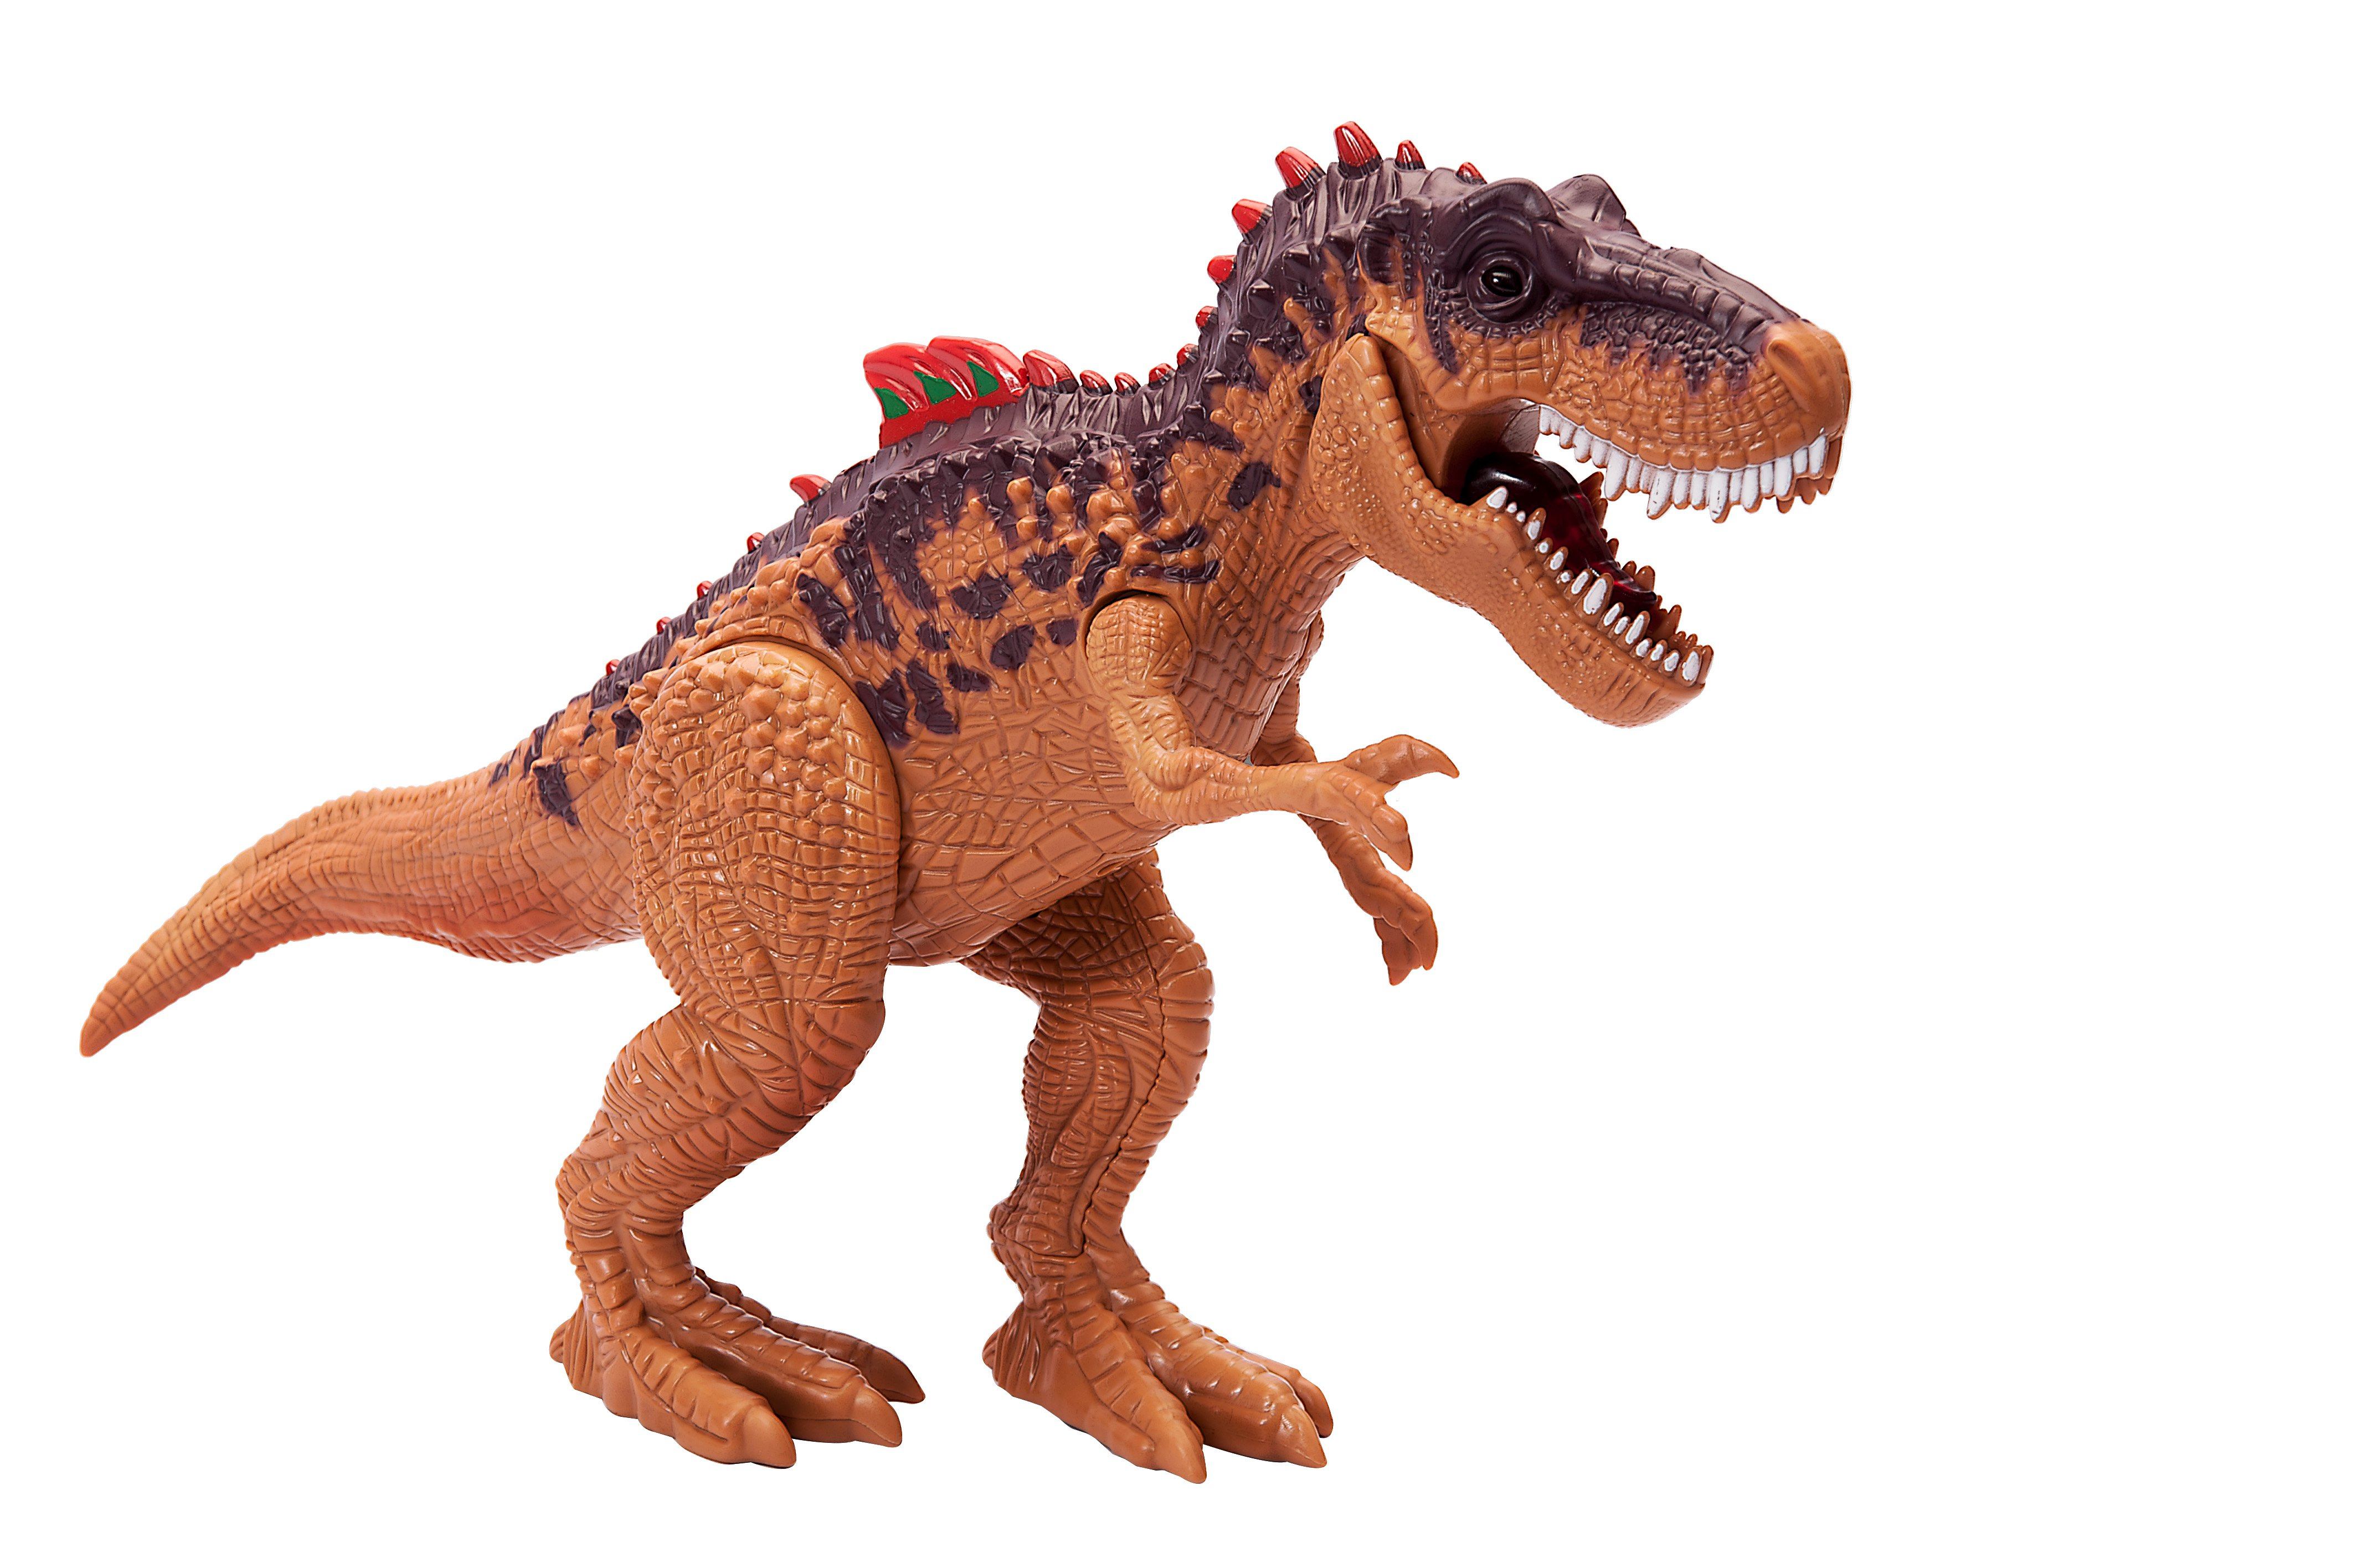 Dino Valley - Big Dino - Brown T-rex